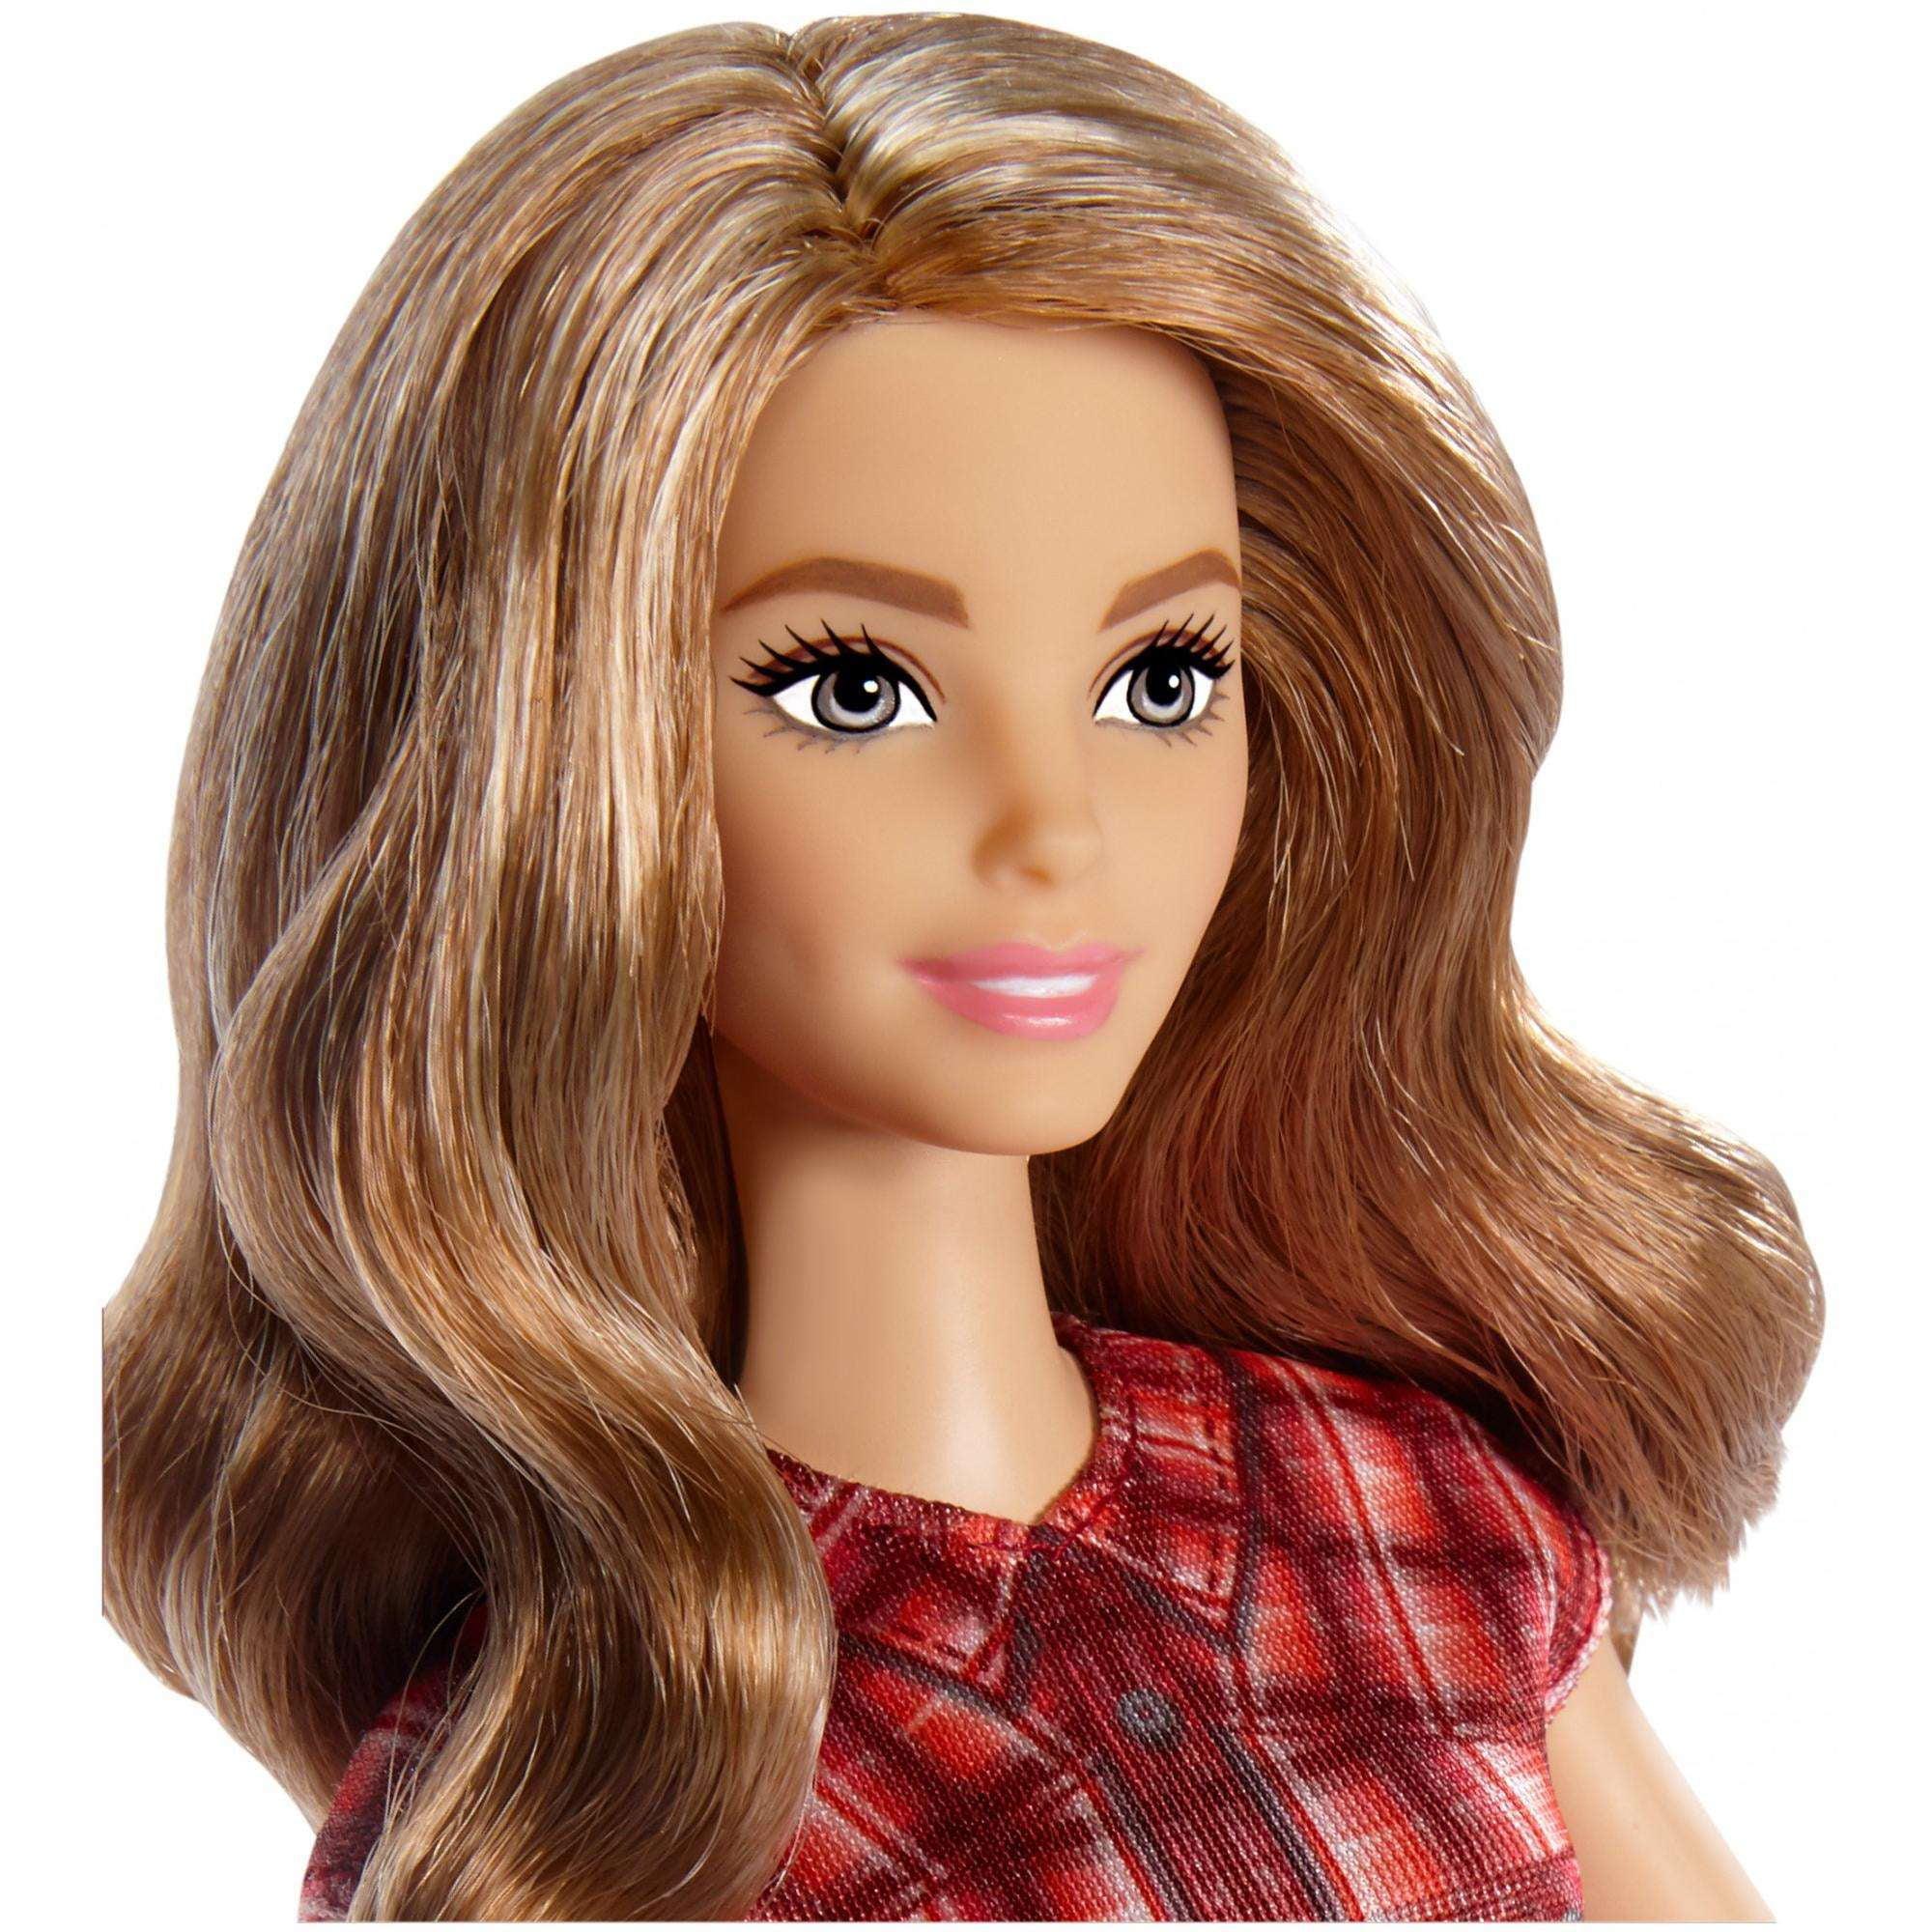 Barbie Farmer Doll - Walmart.com